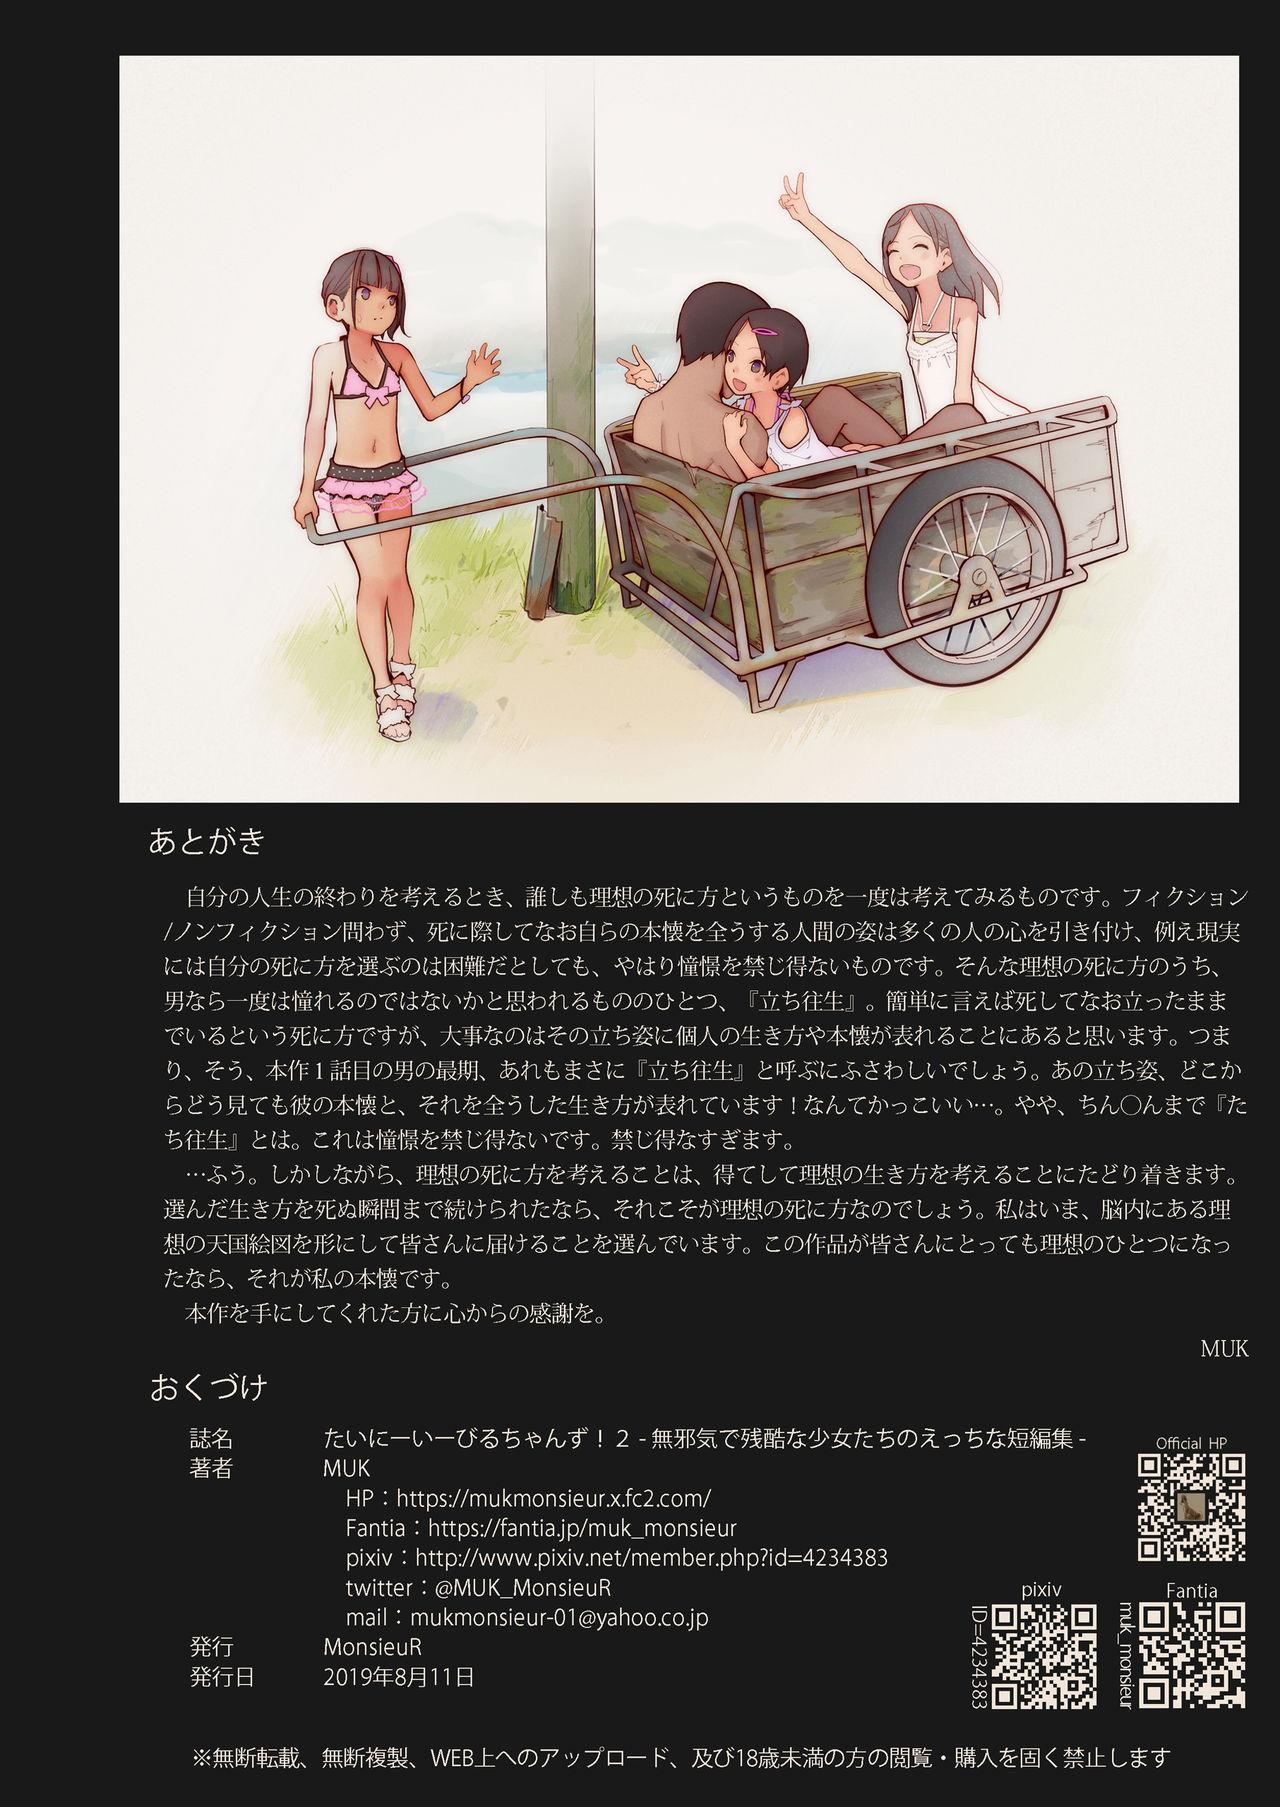 [MonsieuR (MUK)] Tiny Evil chans! 2 -Mujaki de Zankoku na Shoujo-tachi no Ecchi na Tanpenshuu- [English] {Hennojin} [Decensored] [Digital] 37